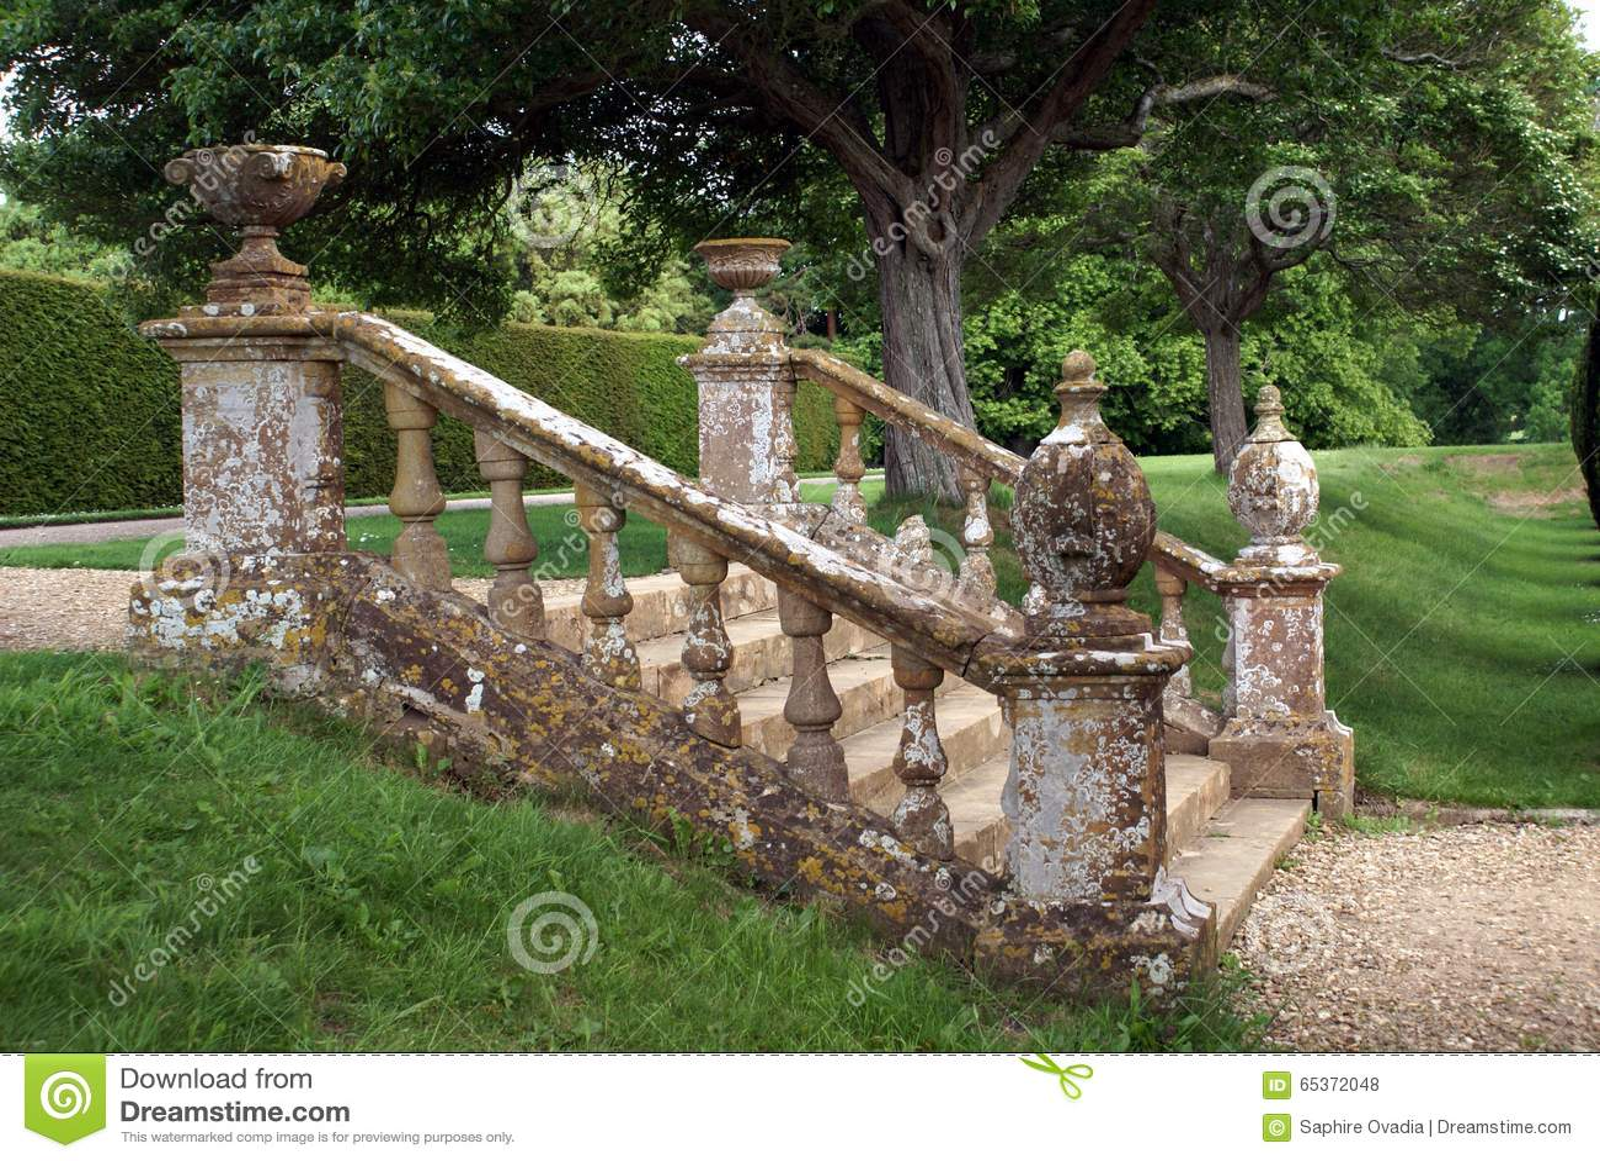 Decorative Garden Steps With A Balustrade, Urns, & Globes. Stock ...